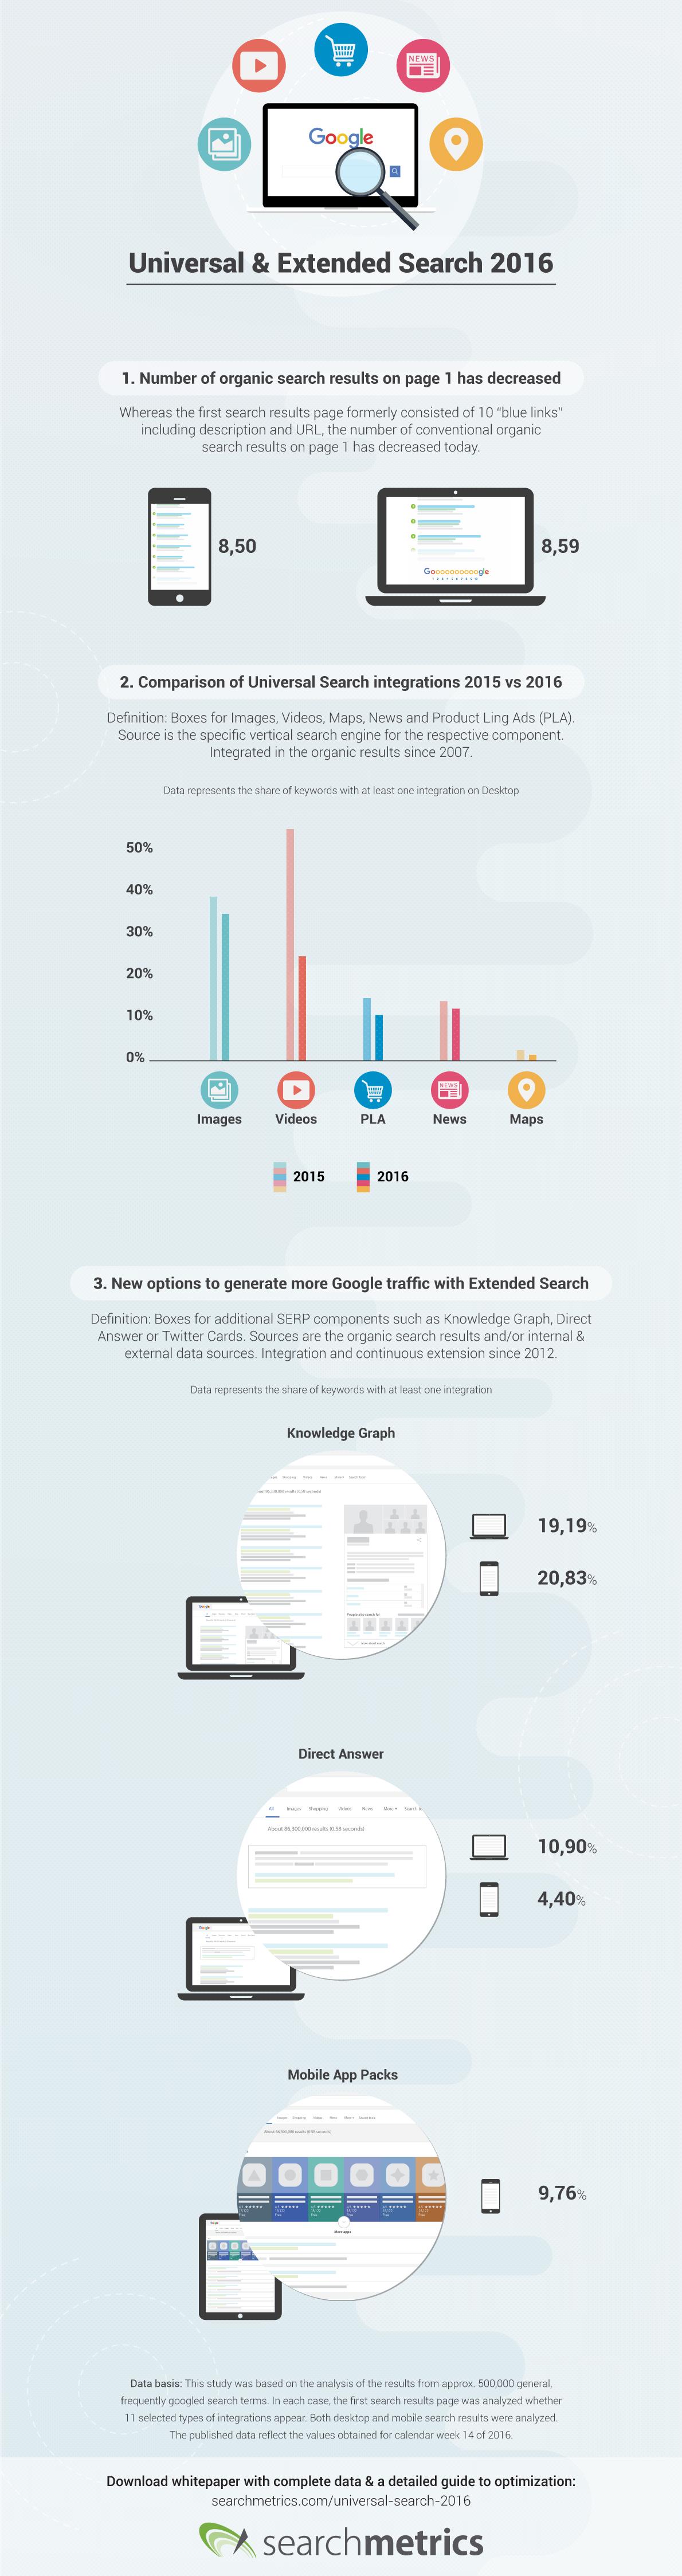 infographie-searchmetrics-recherche-universelle-2016